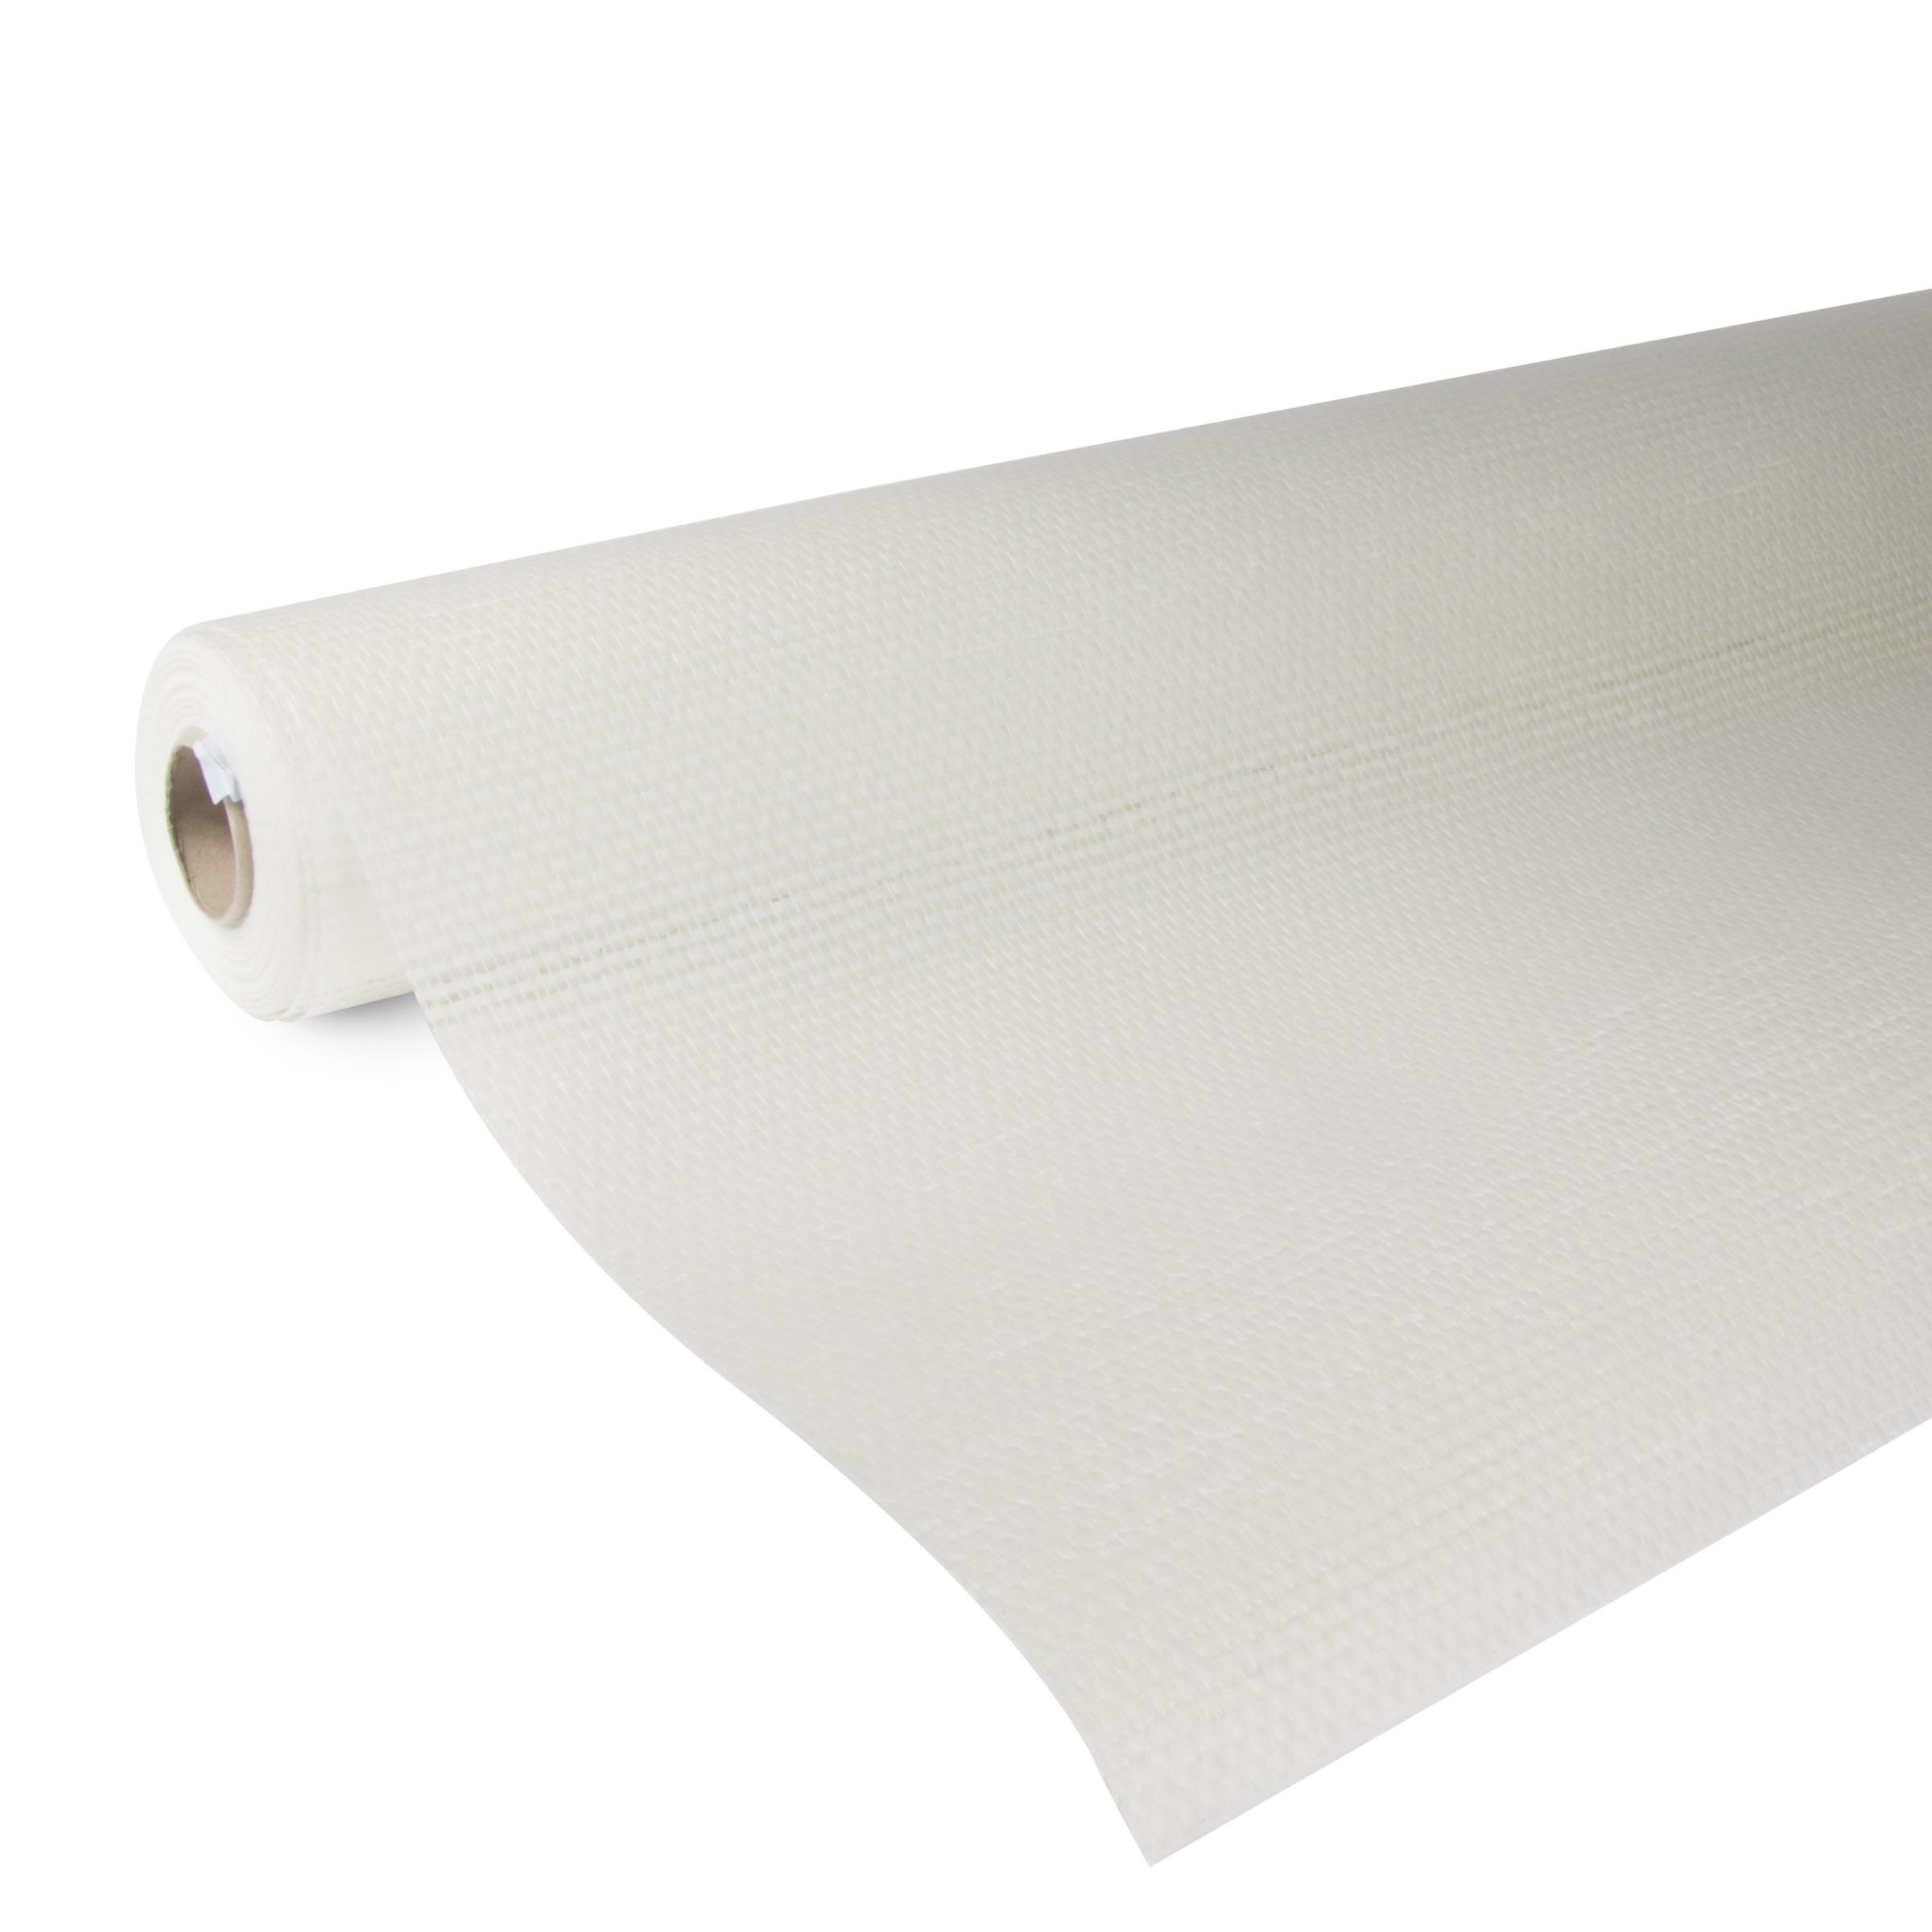 OK glasweefselbehang ruit wit 25 m (dessin P251-25)